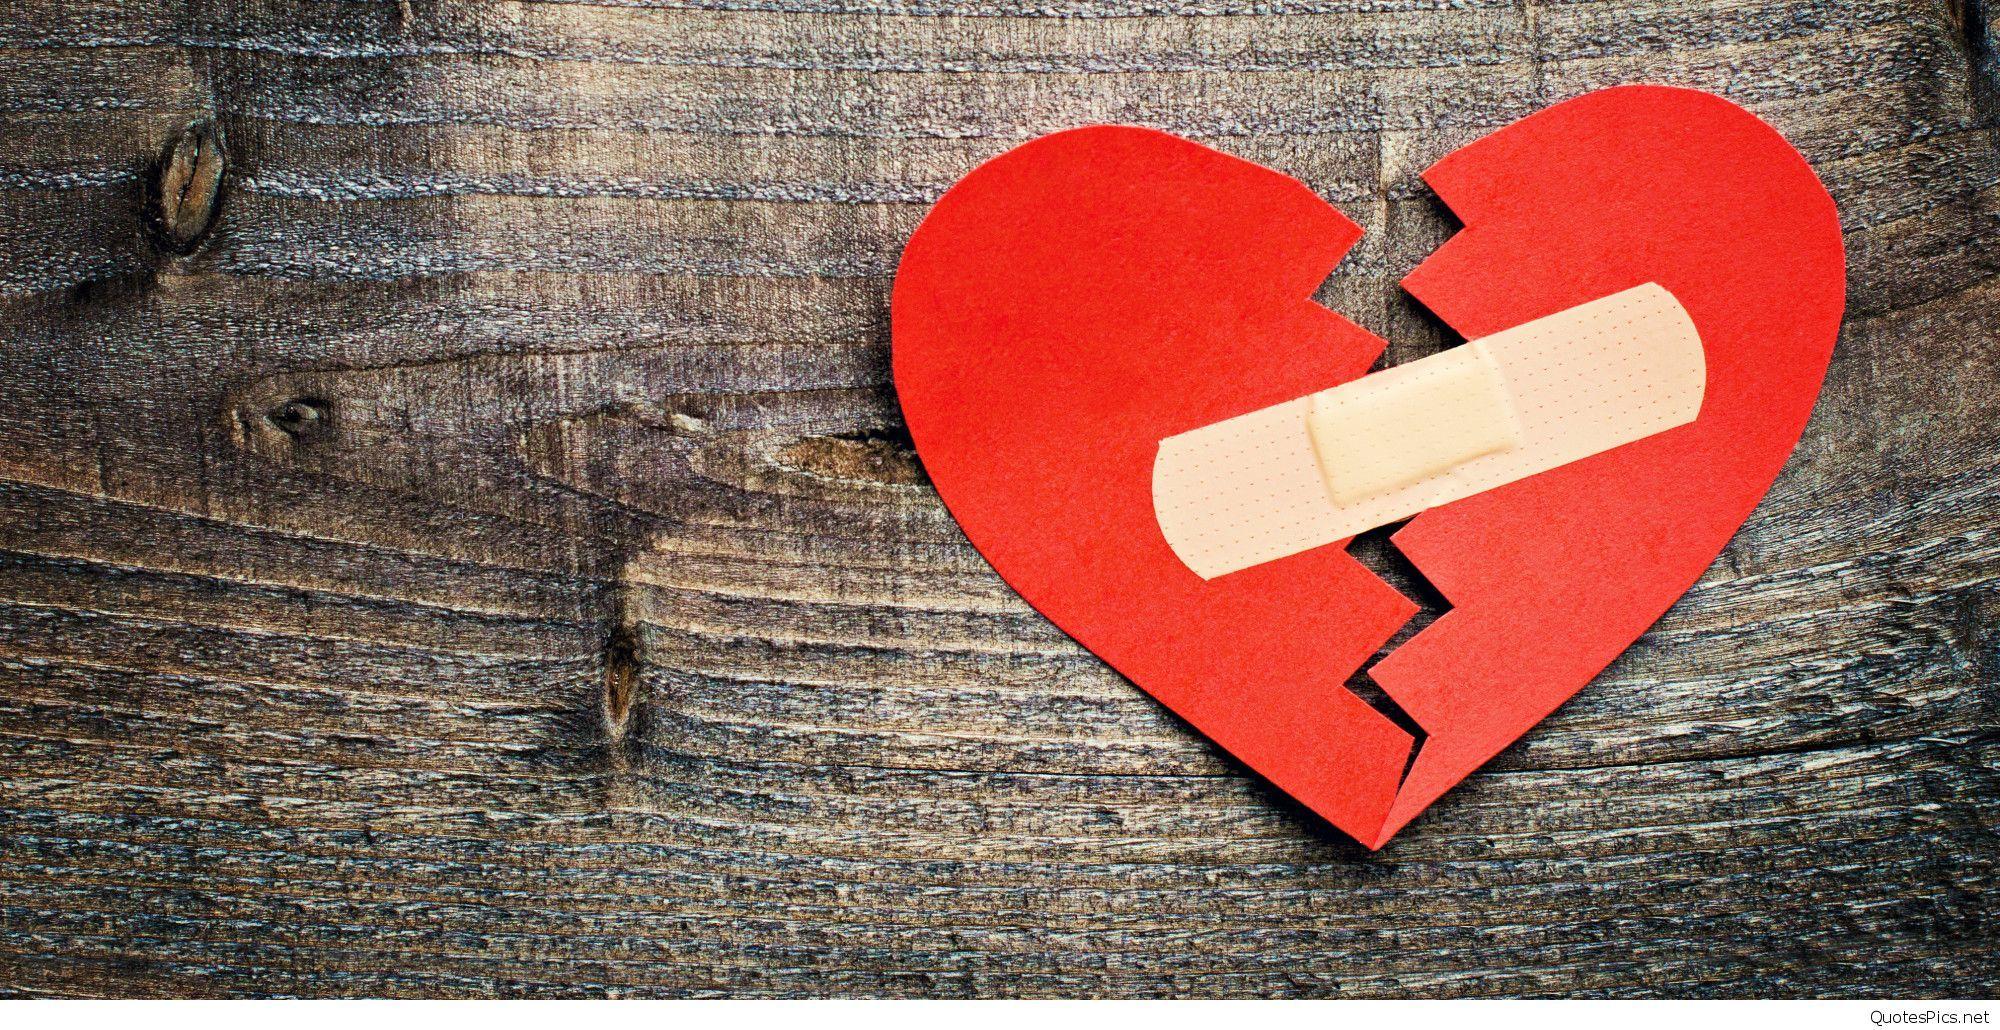 roken heart wallpaper hd images of broken heart ultra hd hd